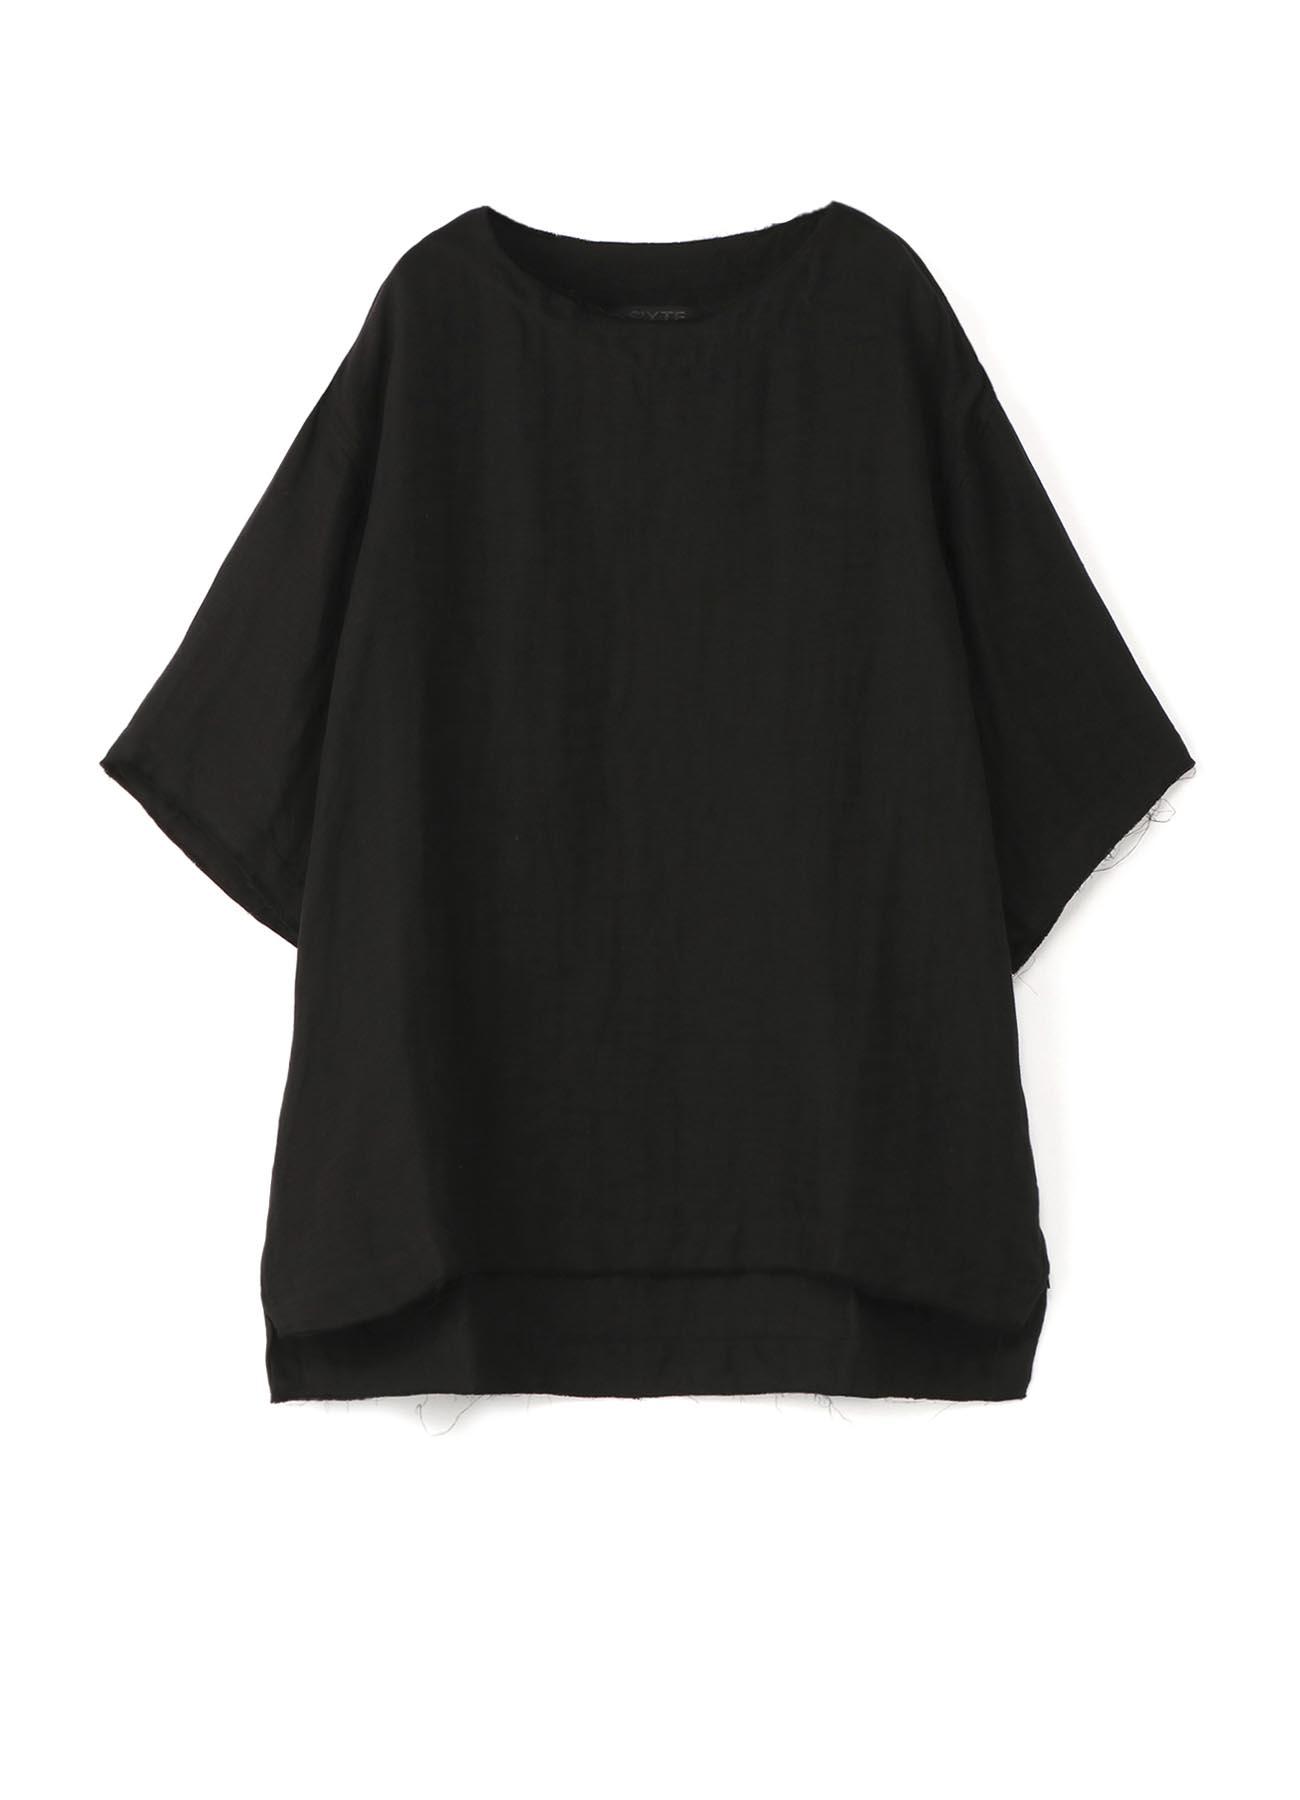 Cotton hemp pullover Crew short sleeve shirt